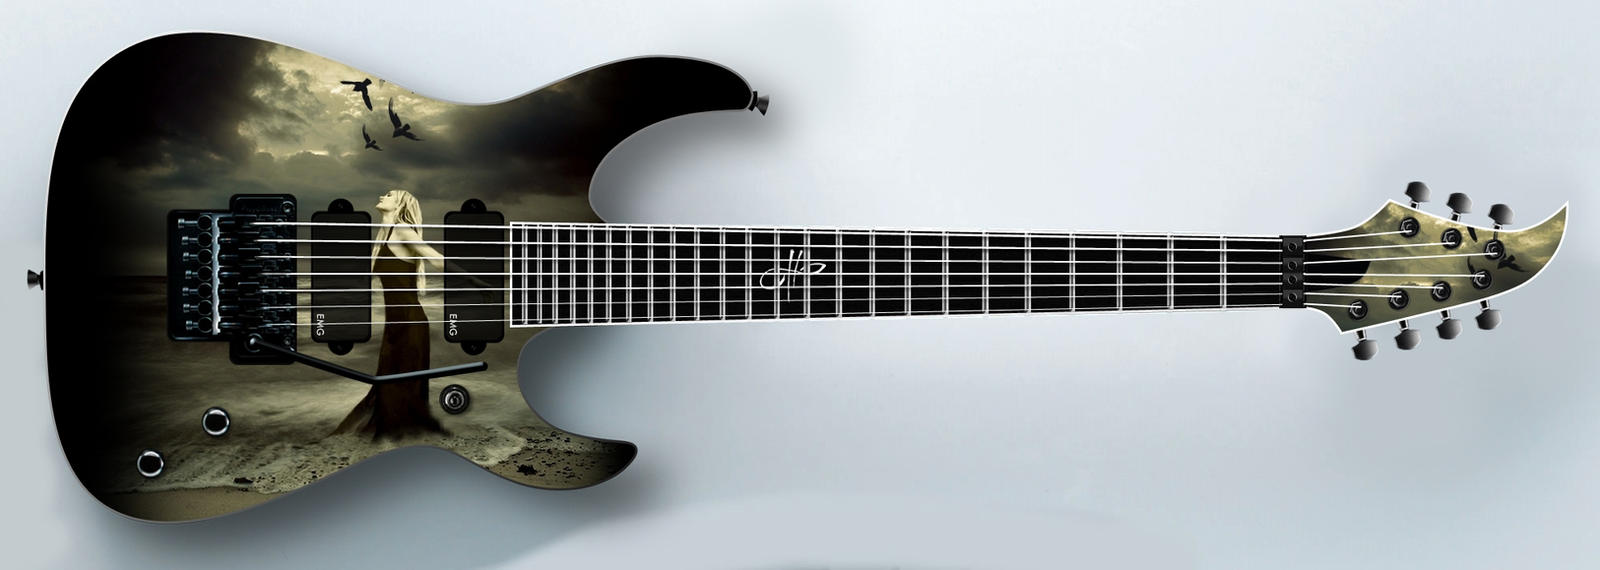 Guitar Designs Art : Artwork guitar design by chatterly on deviantart